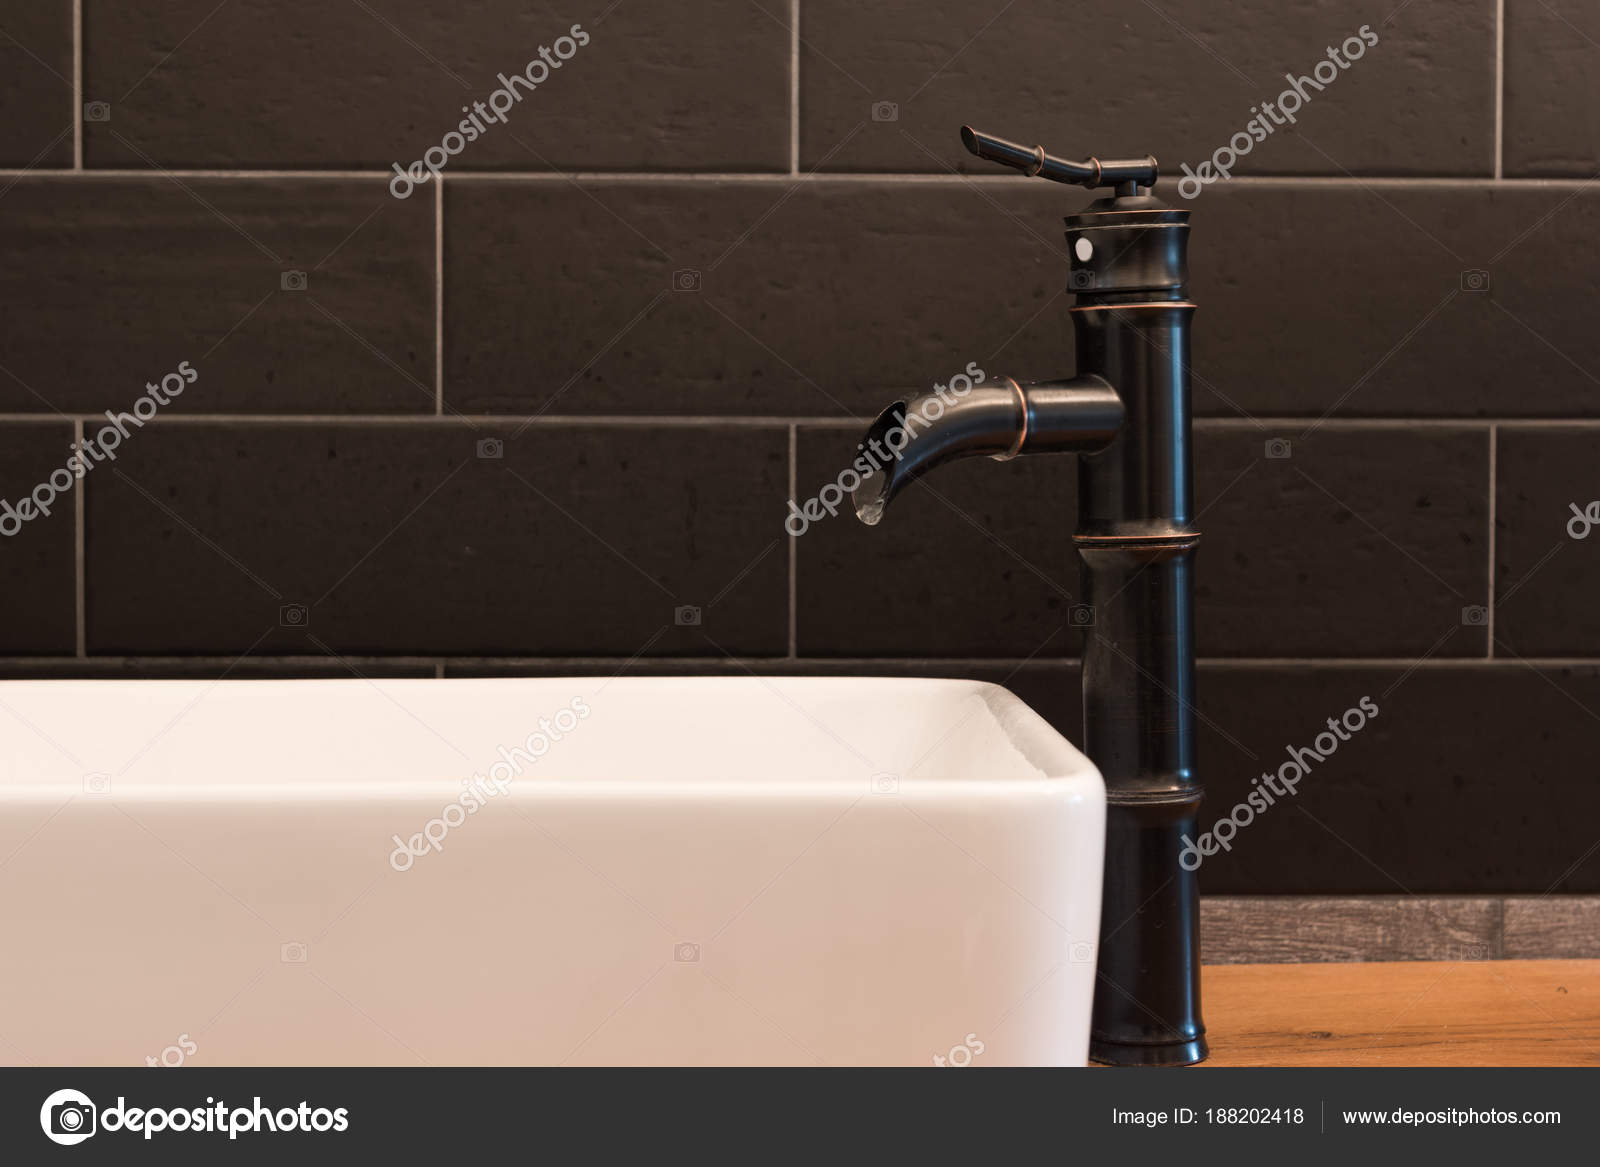 Zwarte Kraan Badkamer : Zwarte kranen in de badkamer yes please